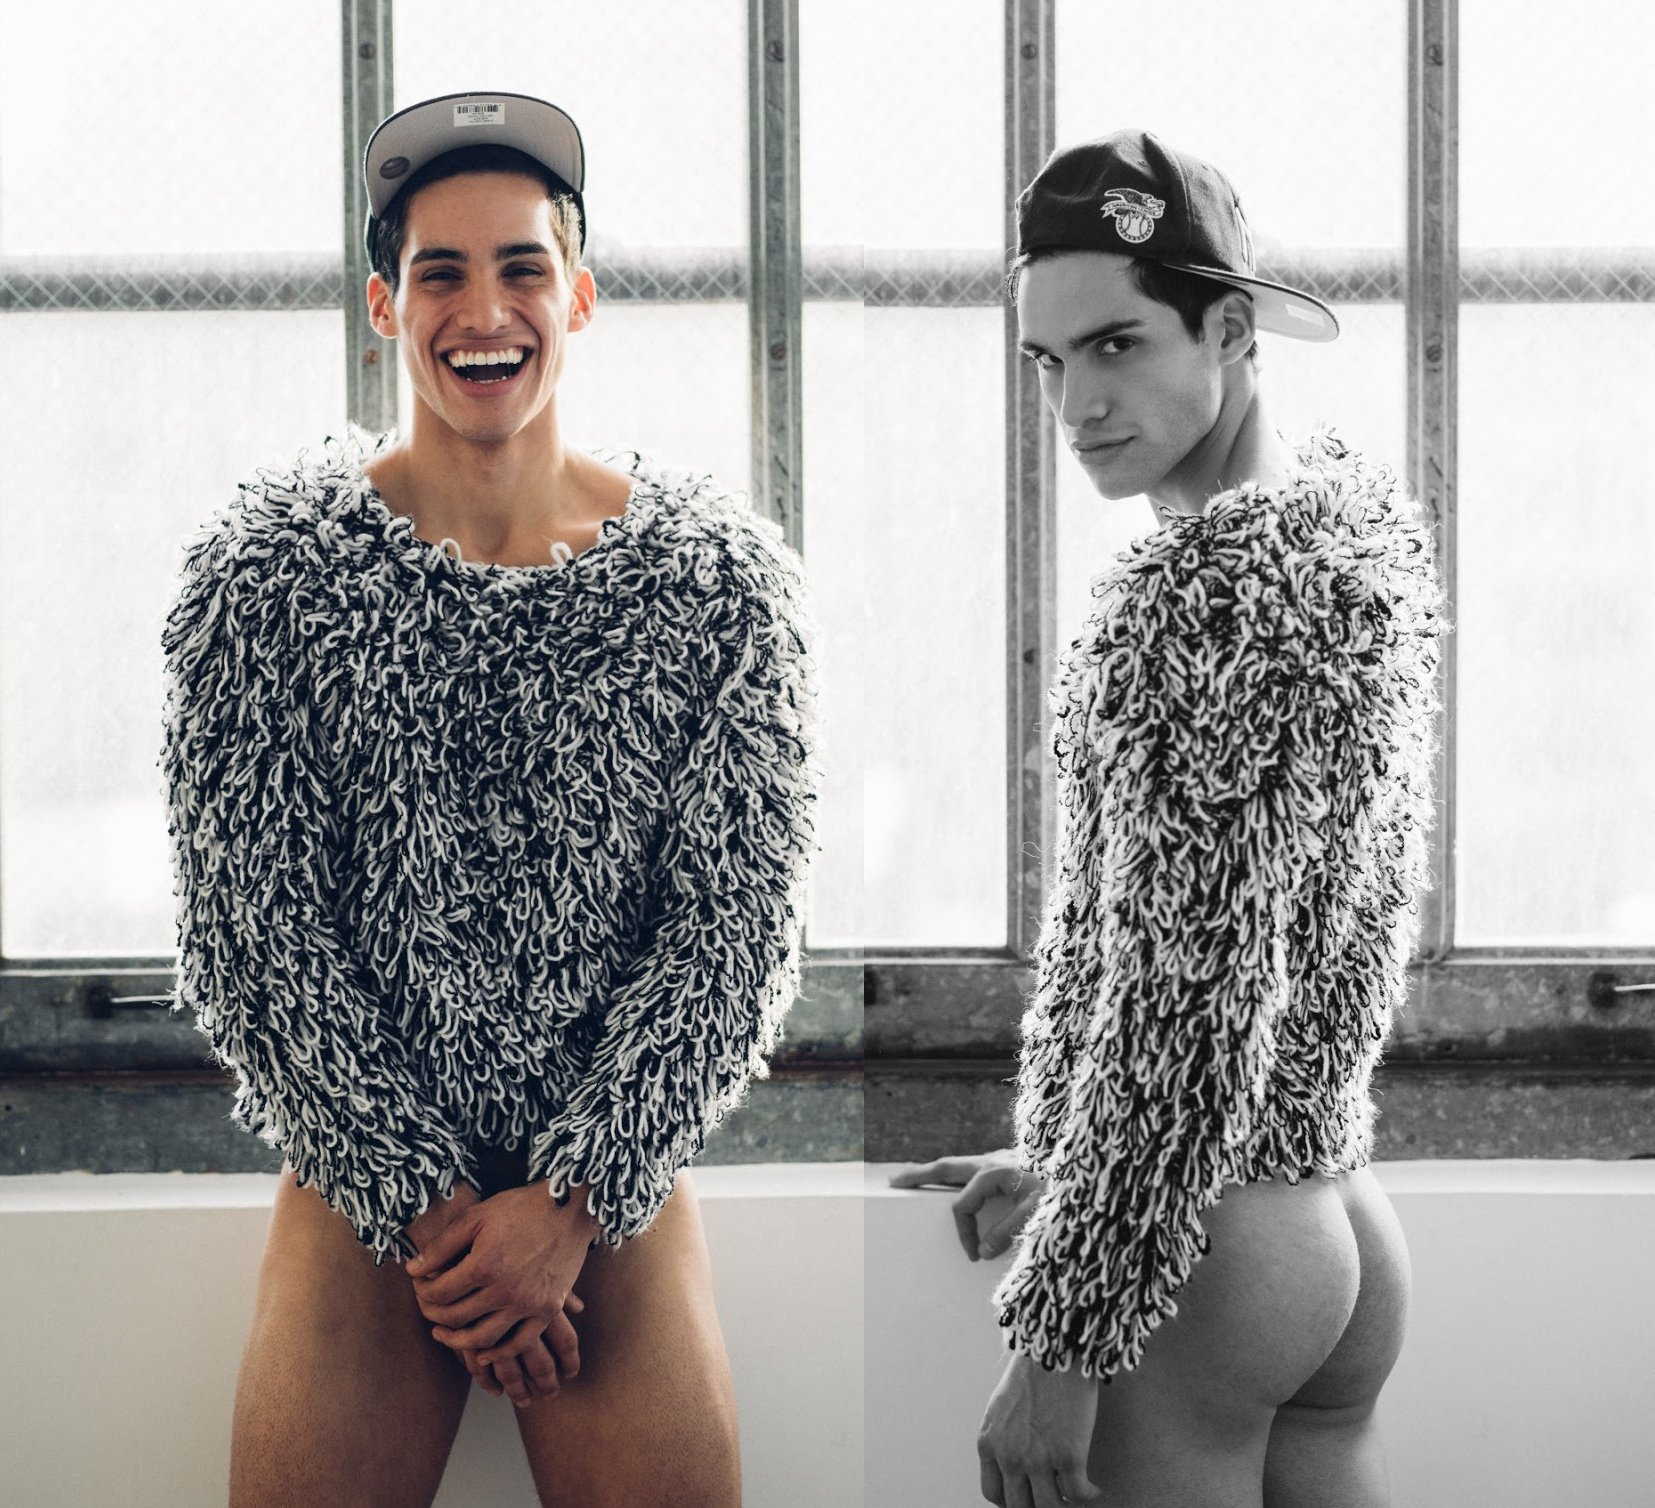 101 best images about Fashion - Men on Pinterest   Models